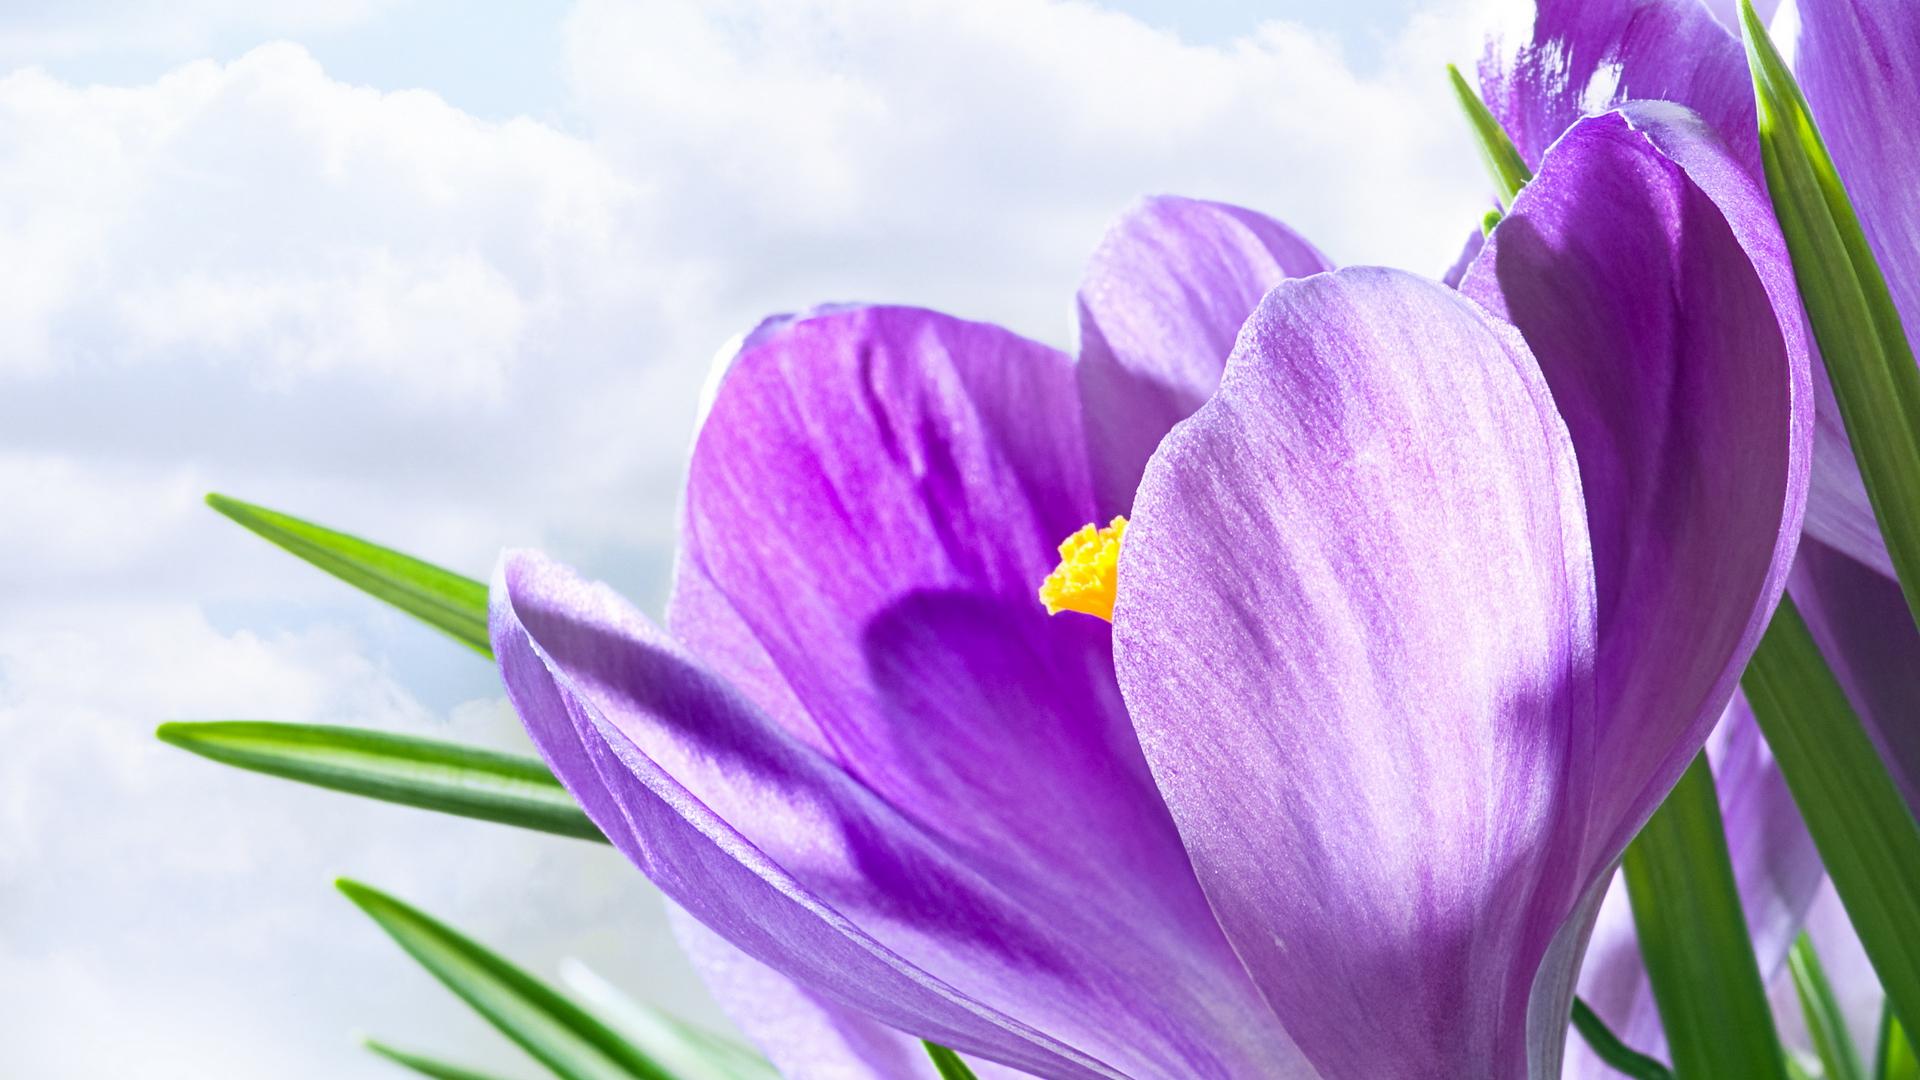 Lavender Color Wallpaper Hd Colorful Flowers Wallpapers Hd Pixelstalk Net